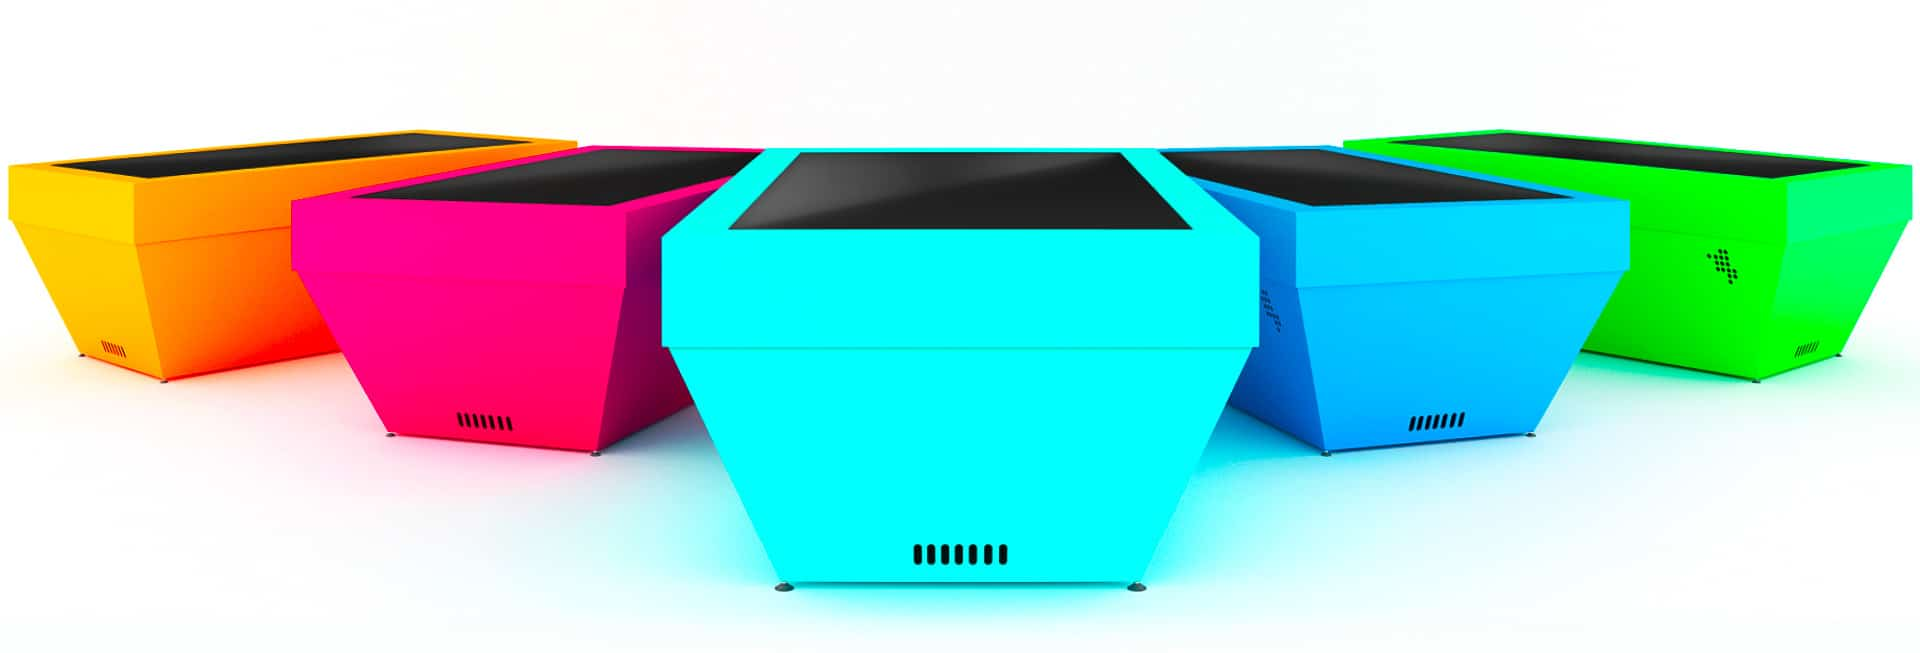 tablebox